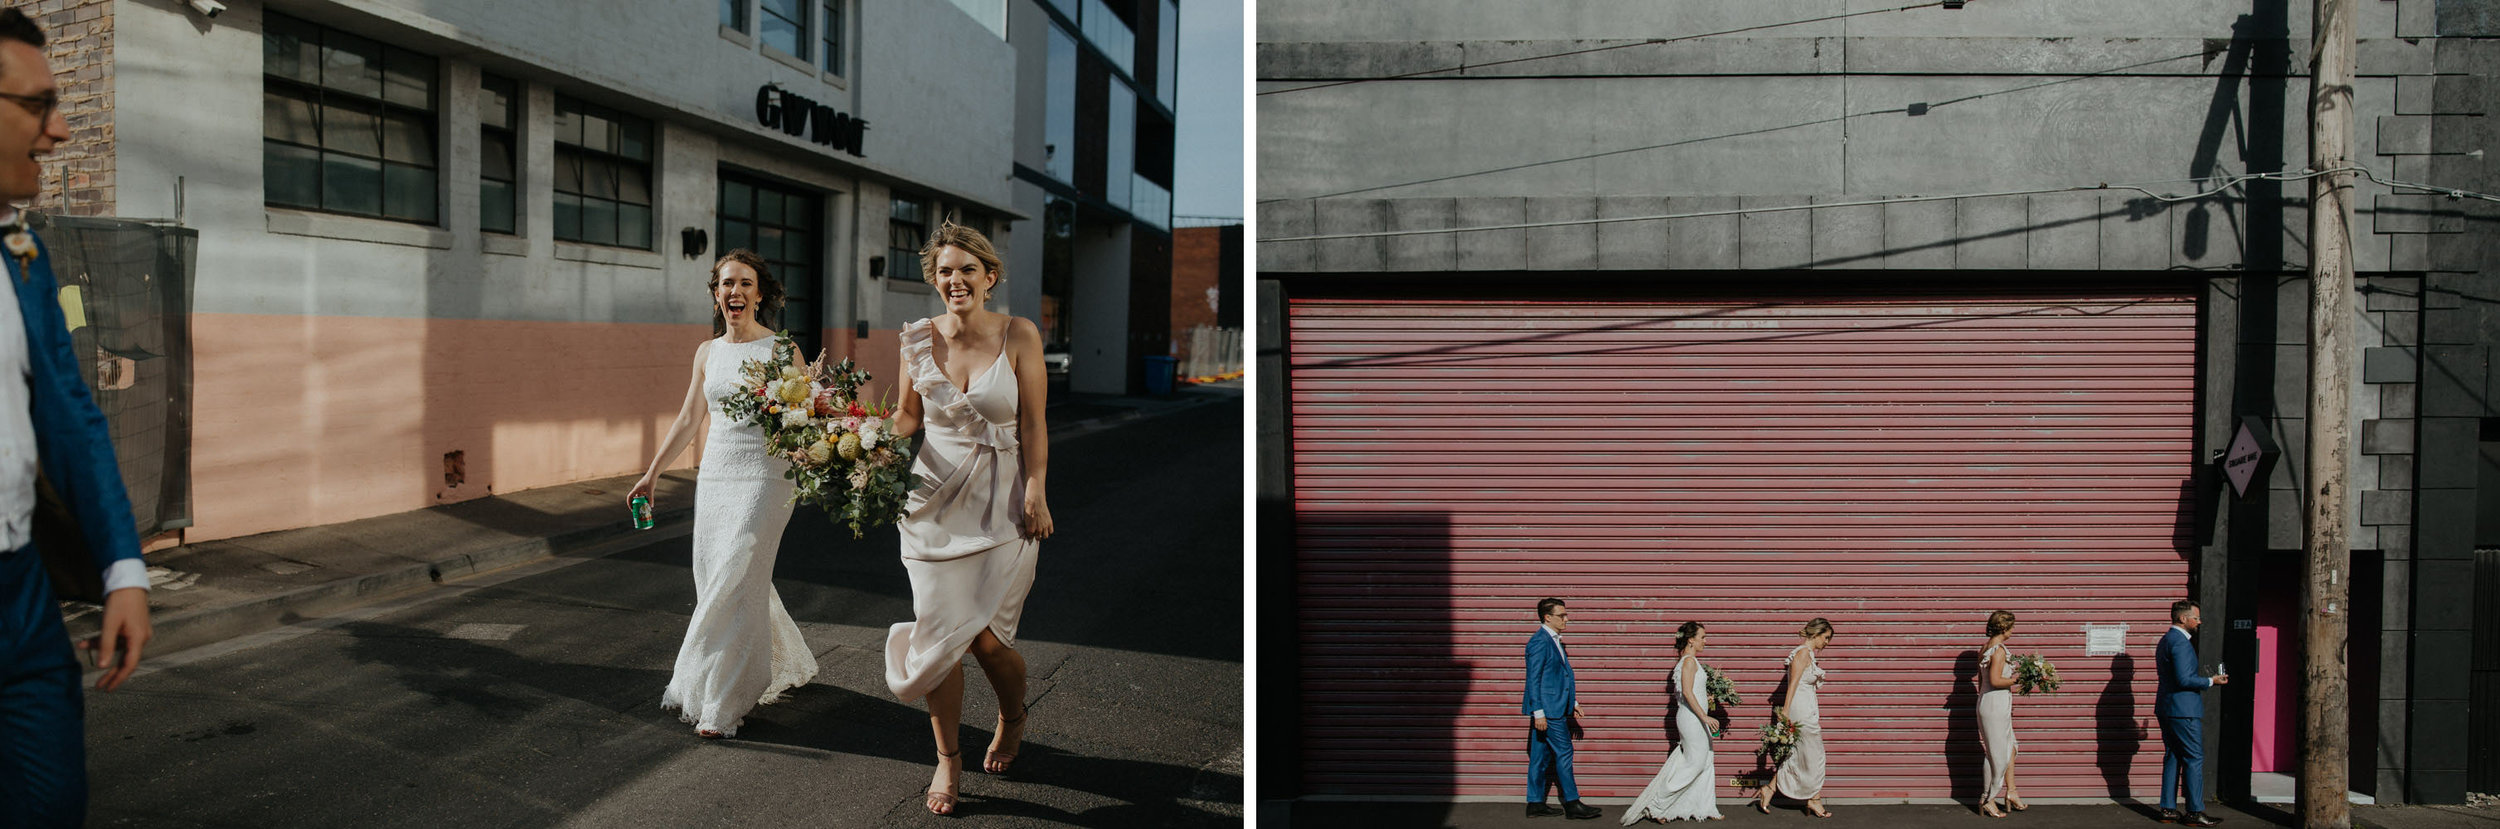 glasshaus_inside_melbourne_wedding_123(2597) copy.jpg